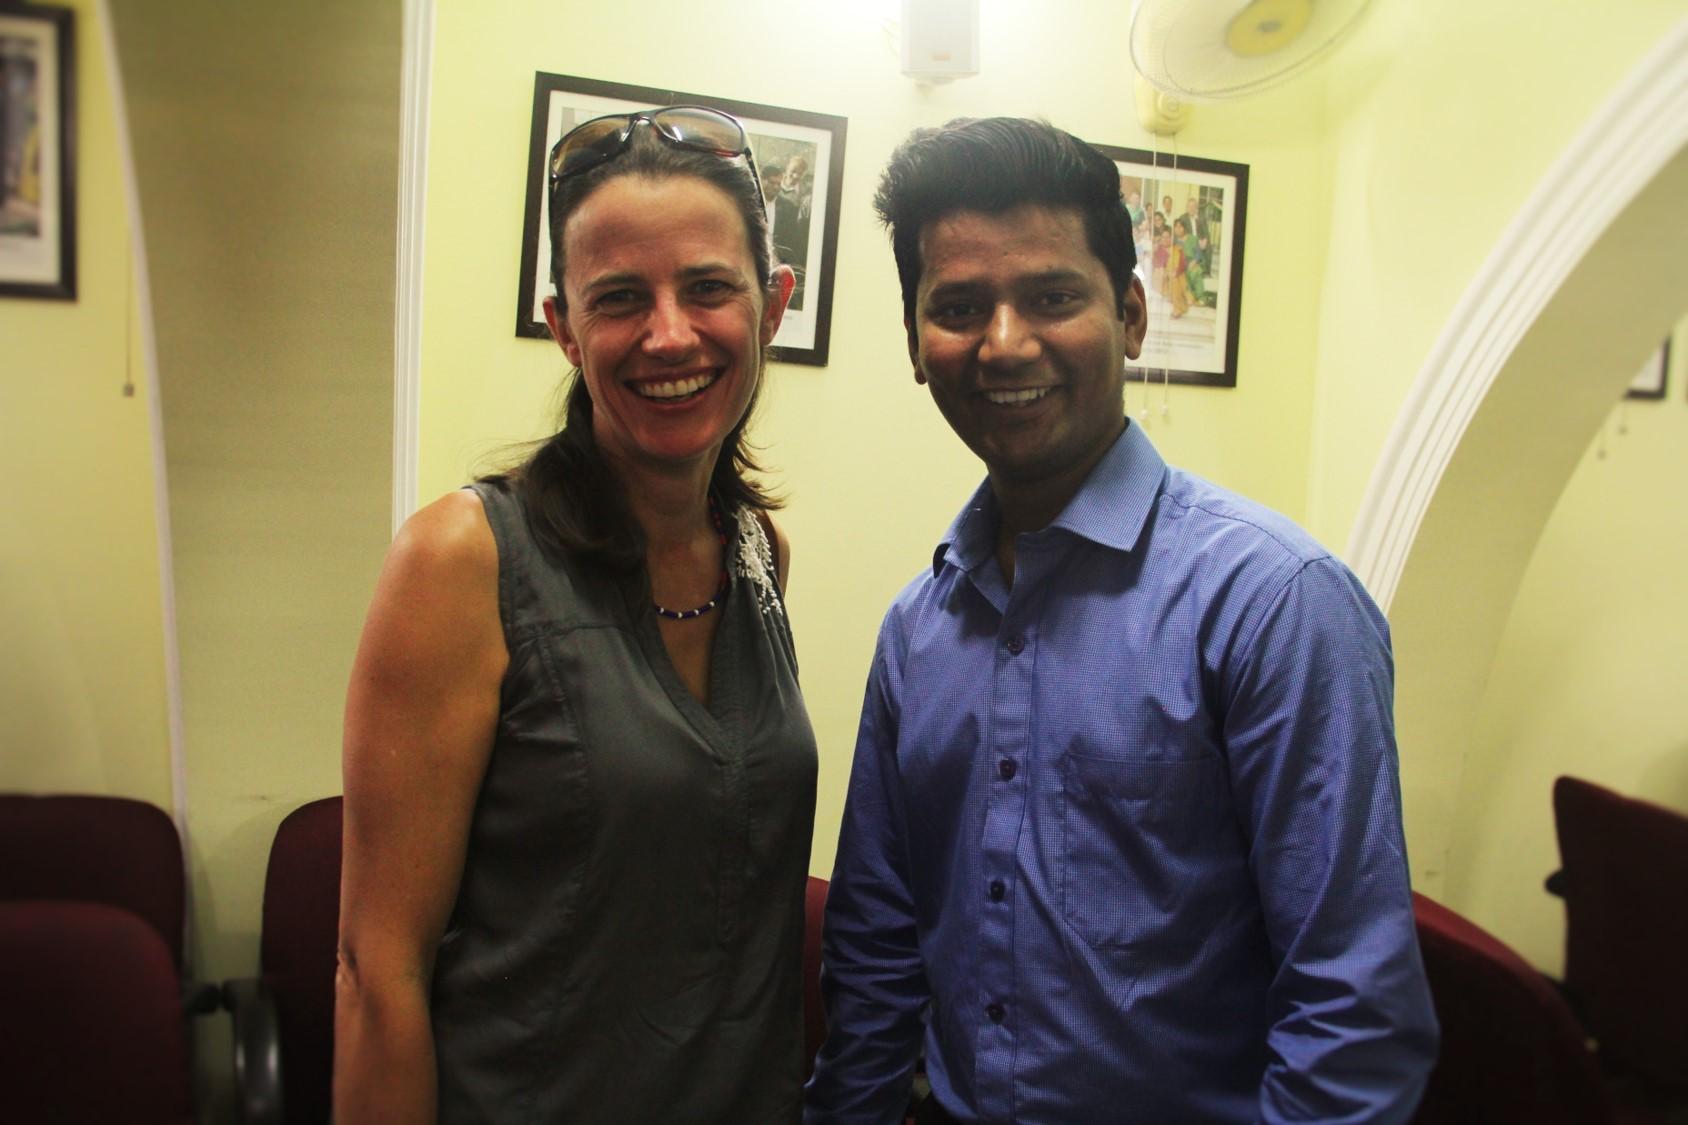 Asha student, Ved Prakash with his mentor Katheriene Ruiz-Avila